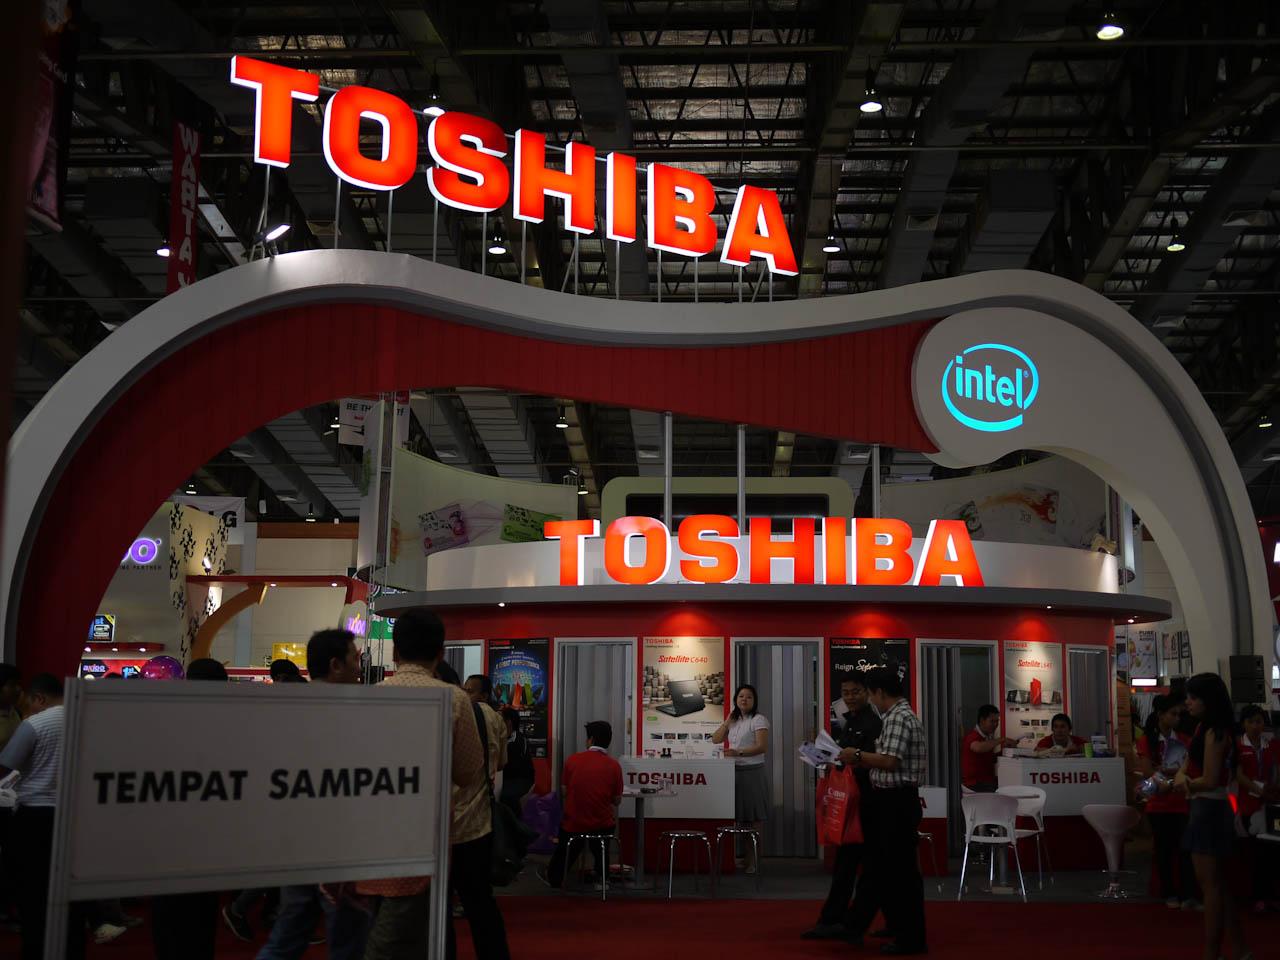 Убытки Toshiba от списания активов Westinghouse превысят $2,5 млрд